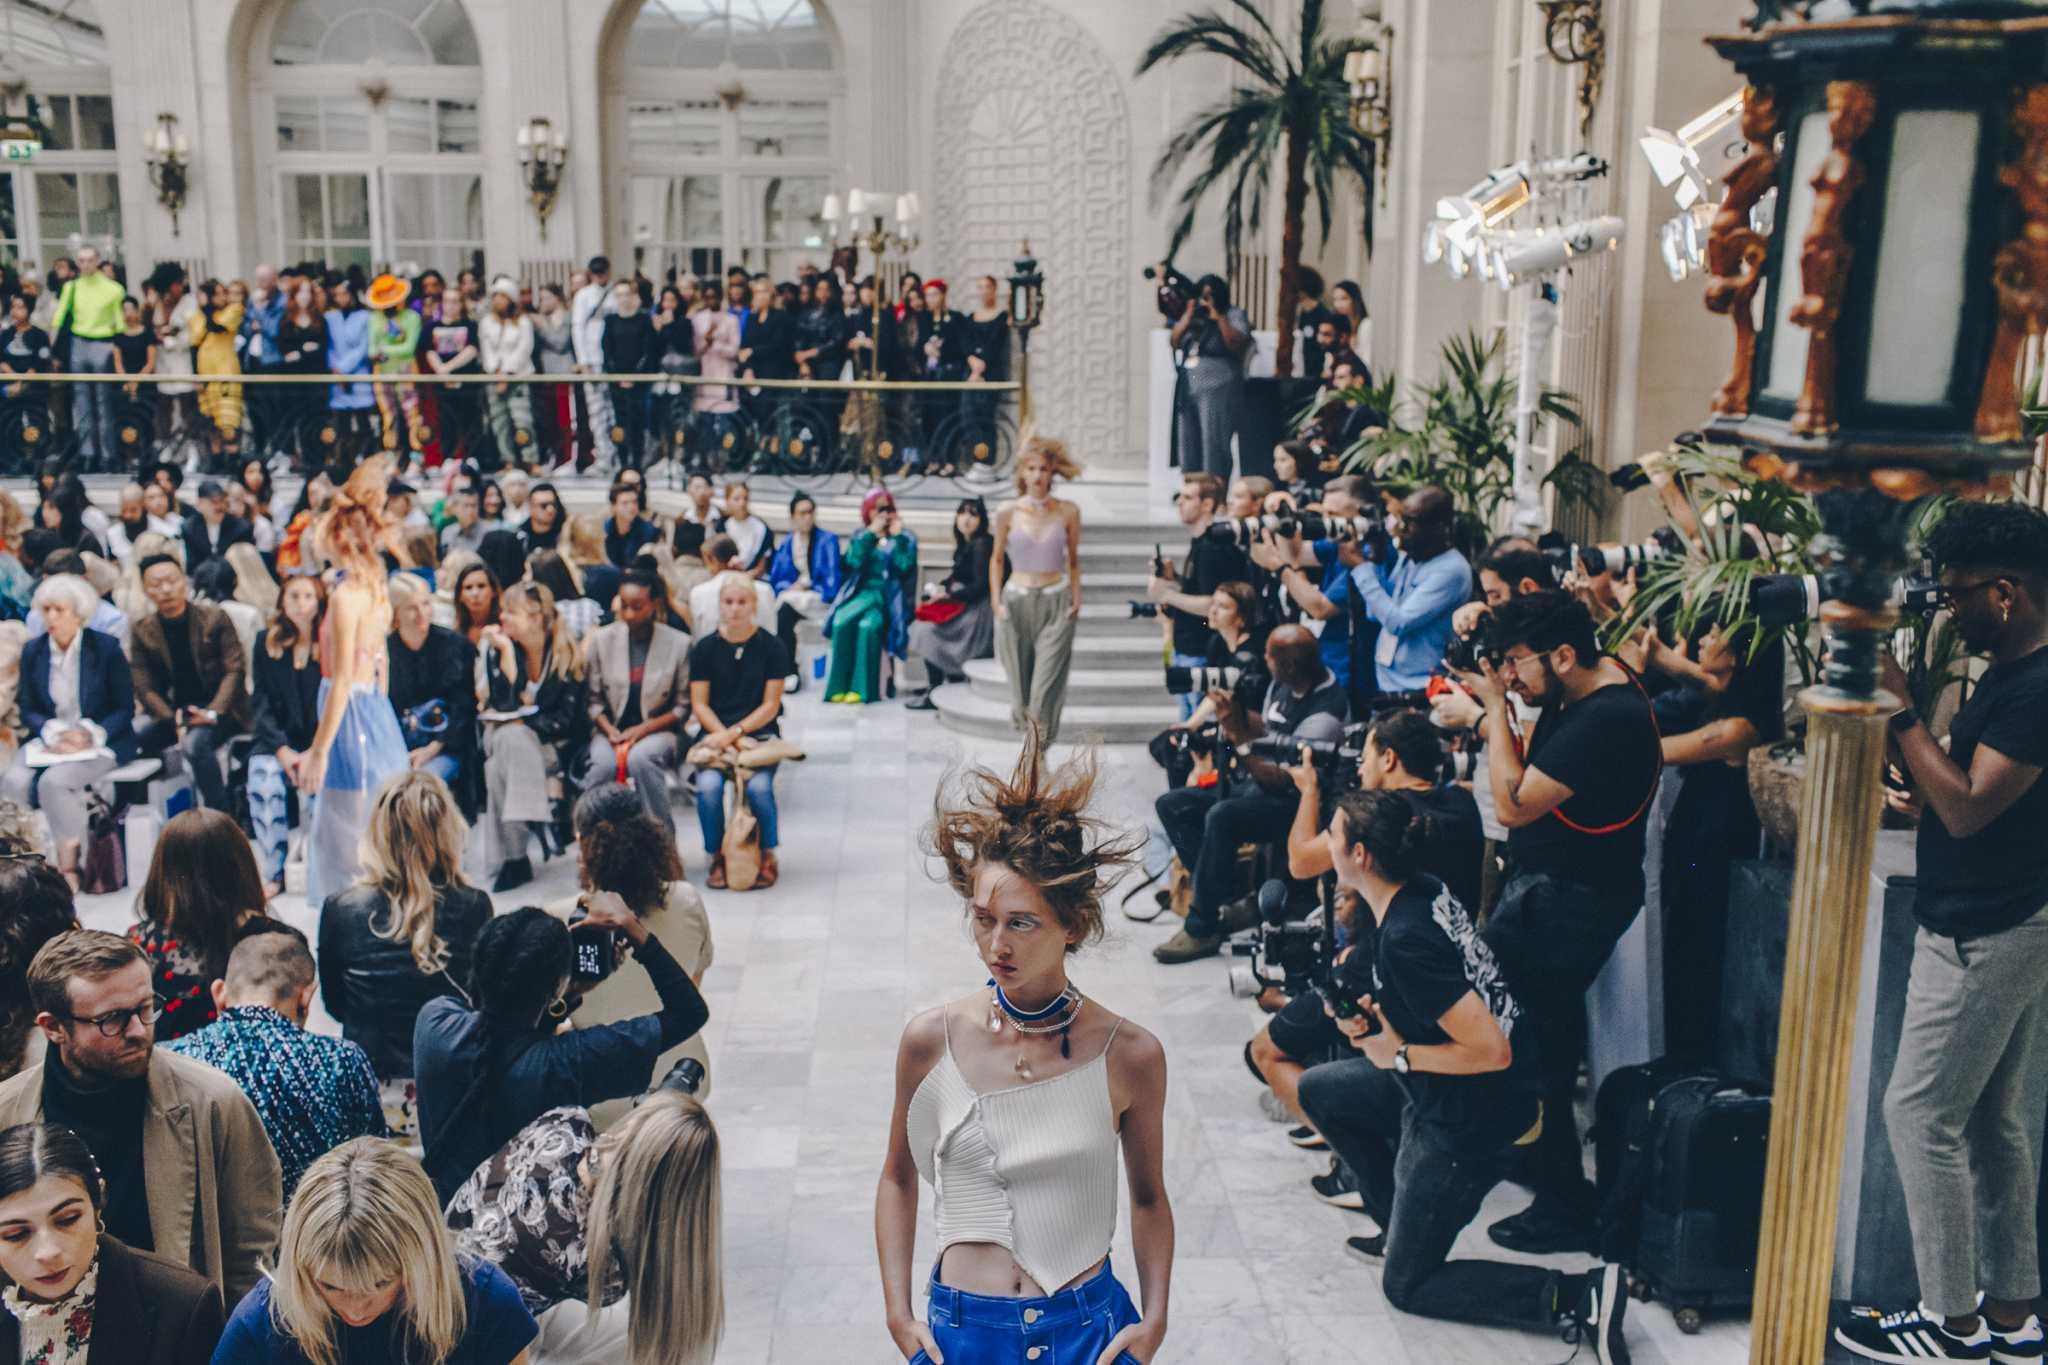 London Fashion week crowd and models